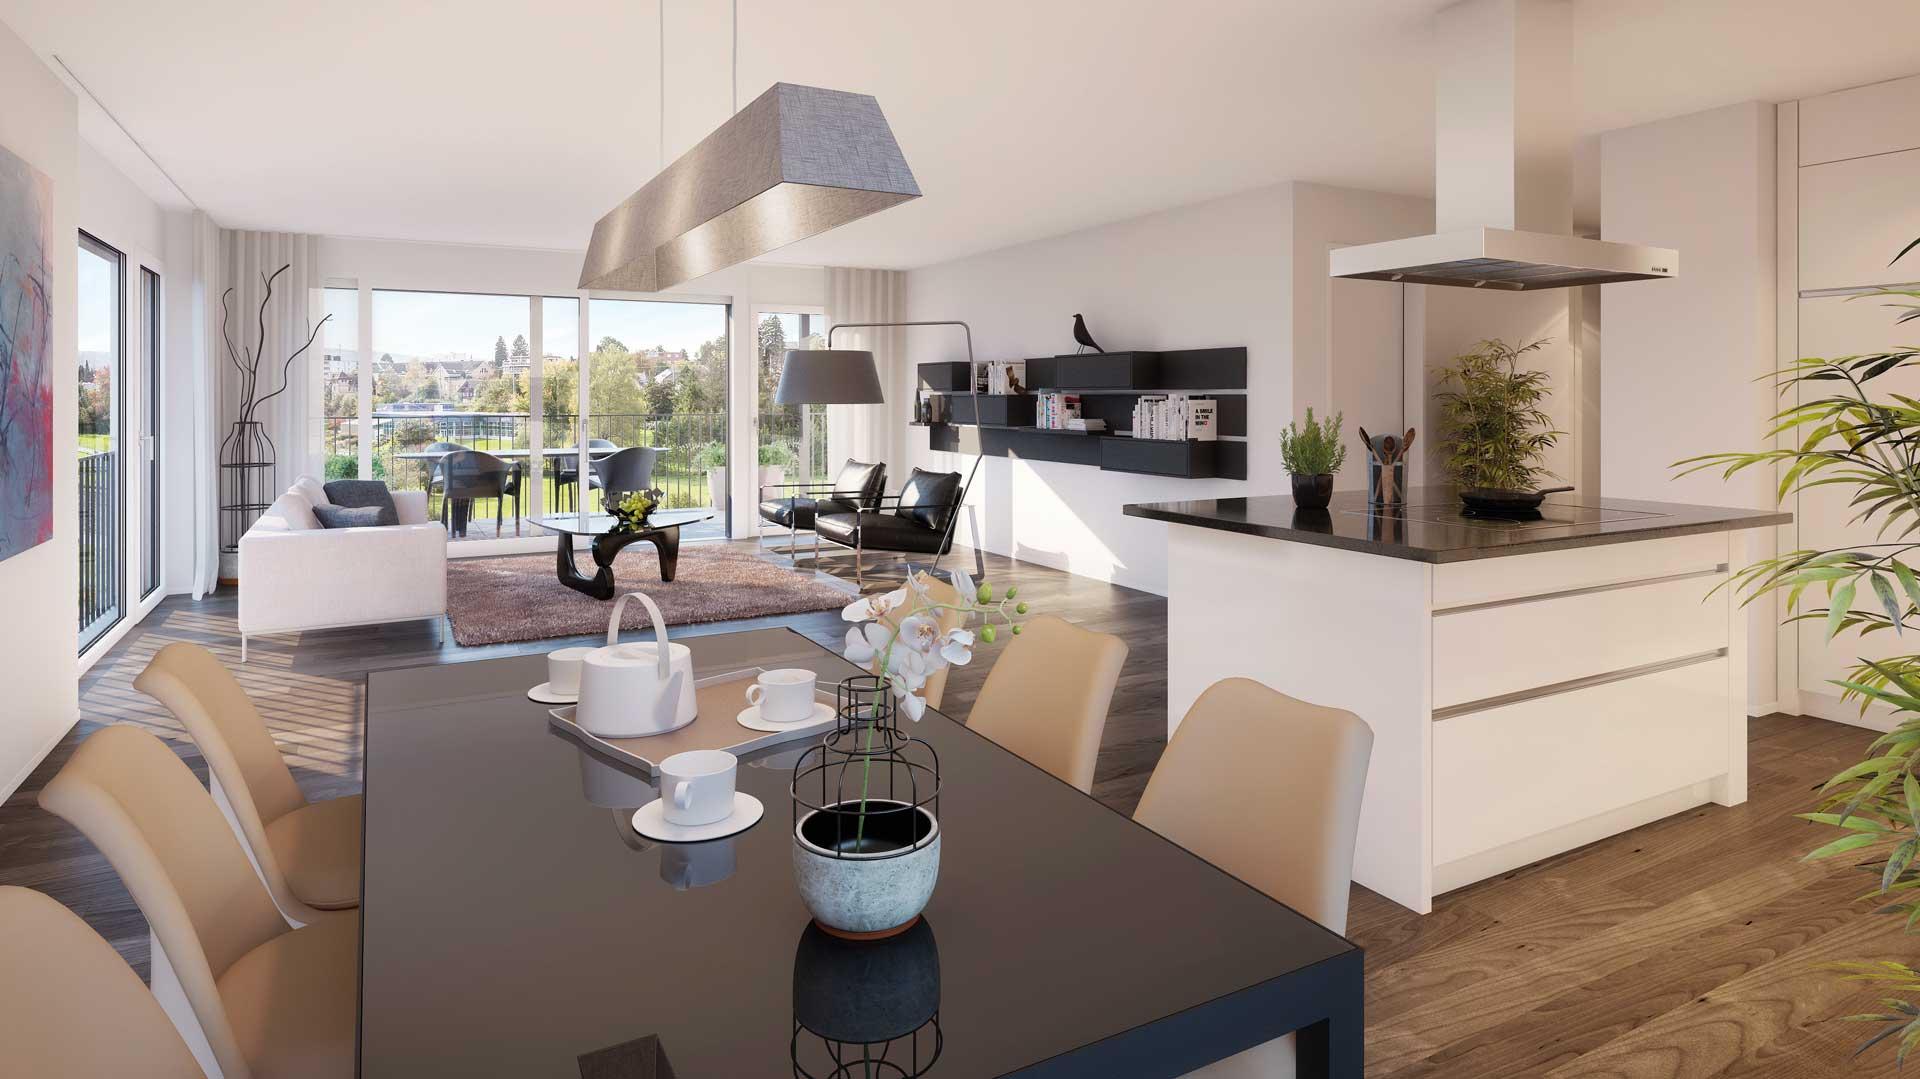 lindenbuck br ttisellen visualisierung lindenbuck. Black Bedroom Furniture Sets. Home Design Ideas